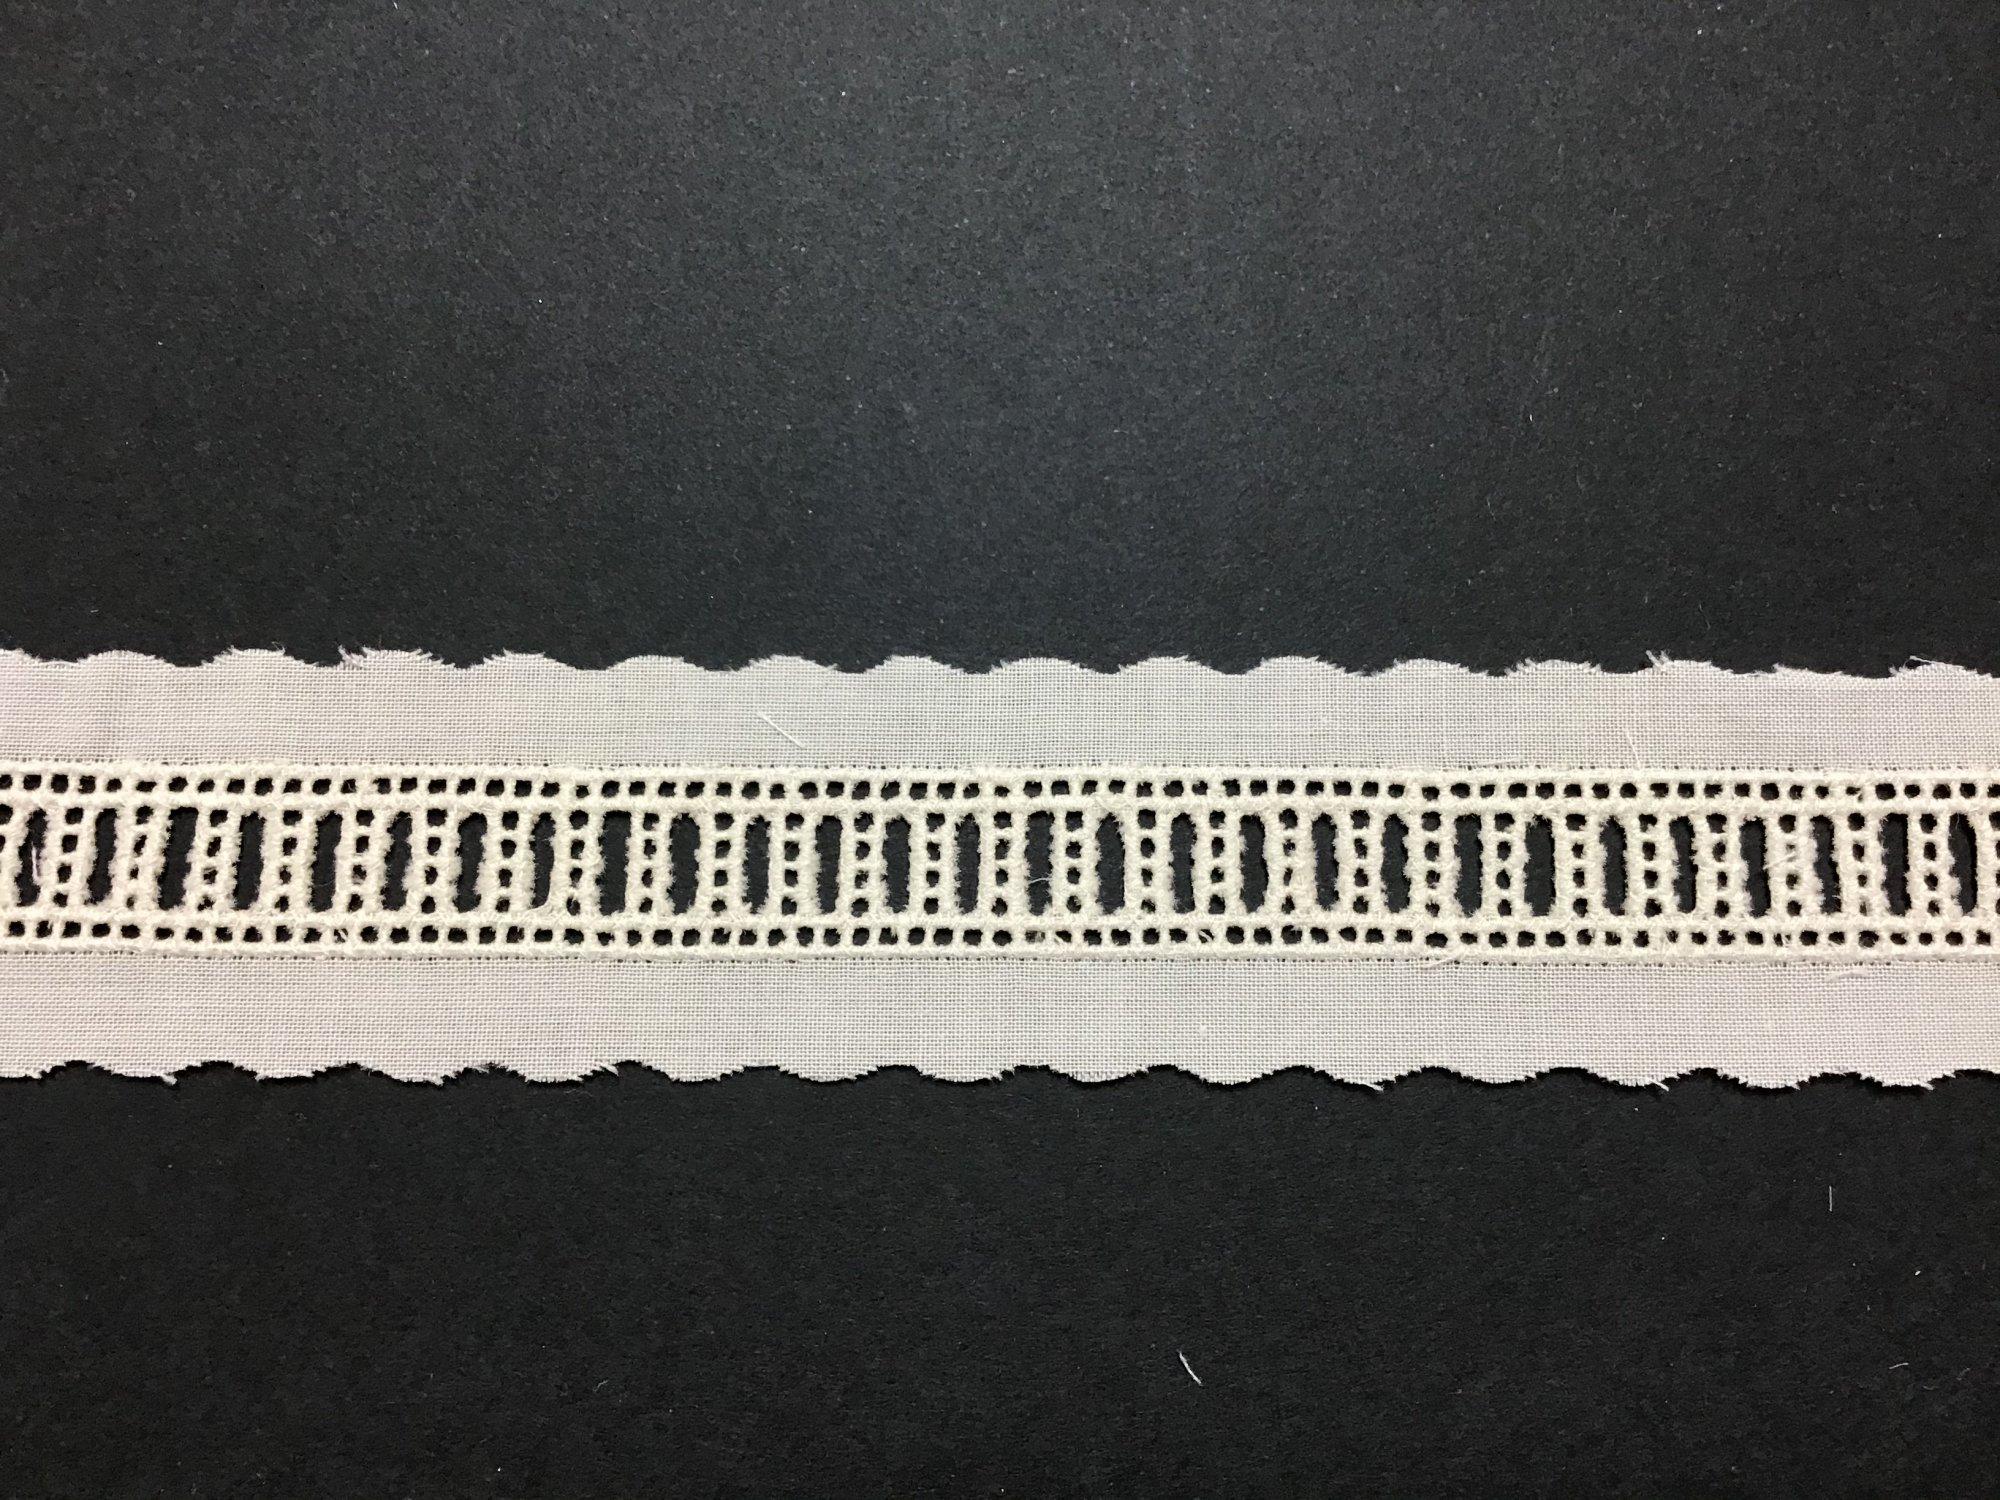 Swiss Embroidered Beading .5 Inch Ecru 71124-04